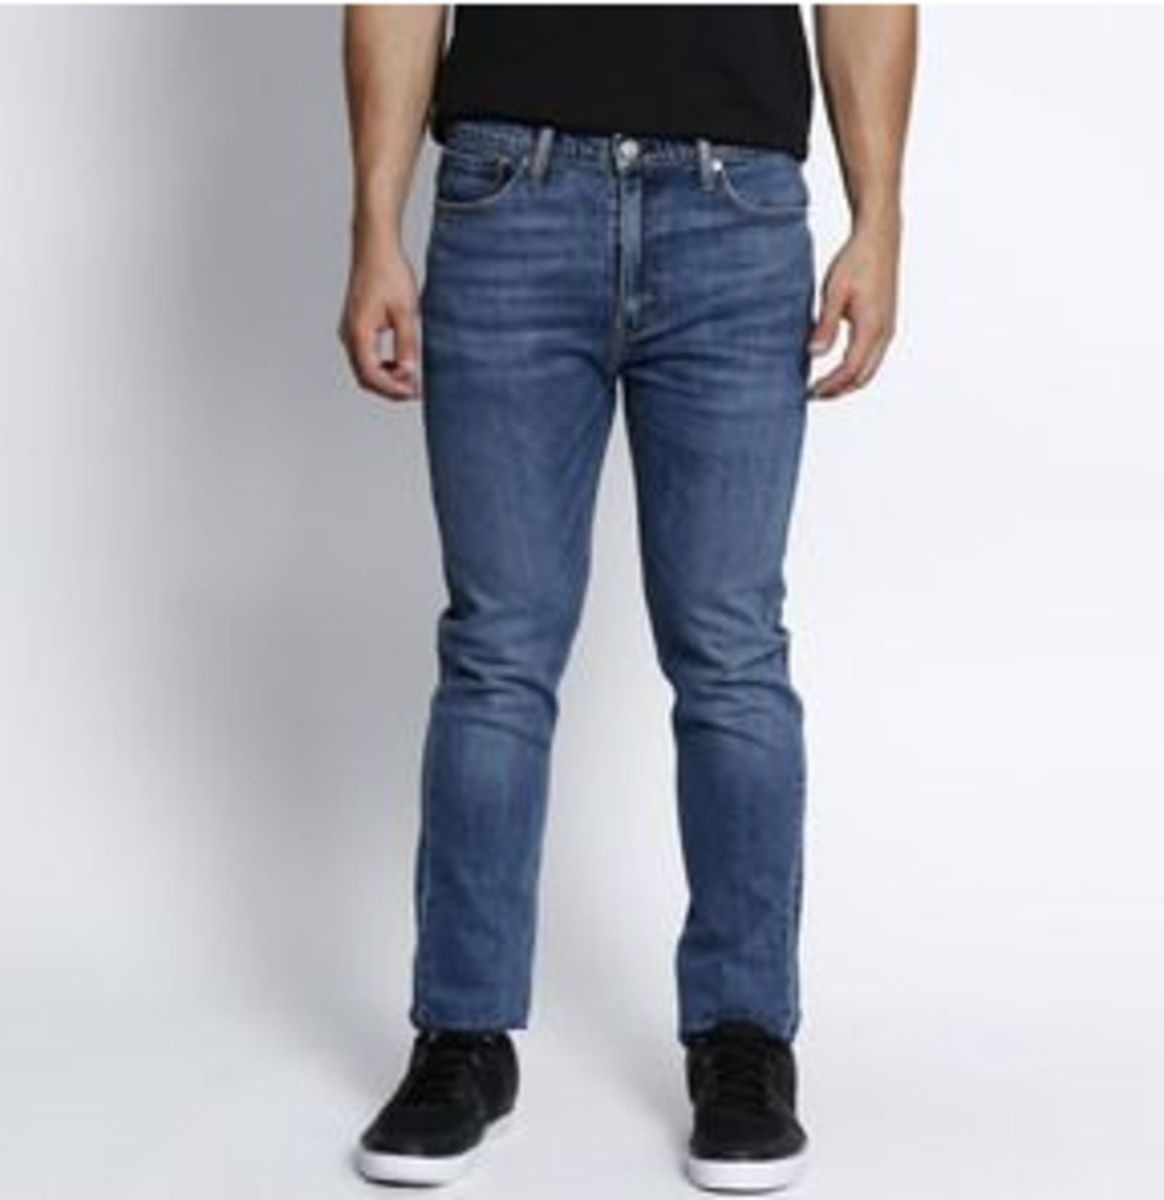 0e5a7ee2a7abe Calça Jeans Masculina